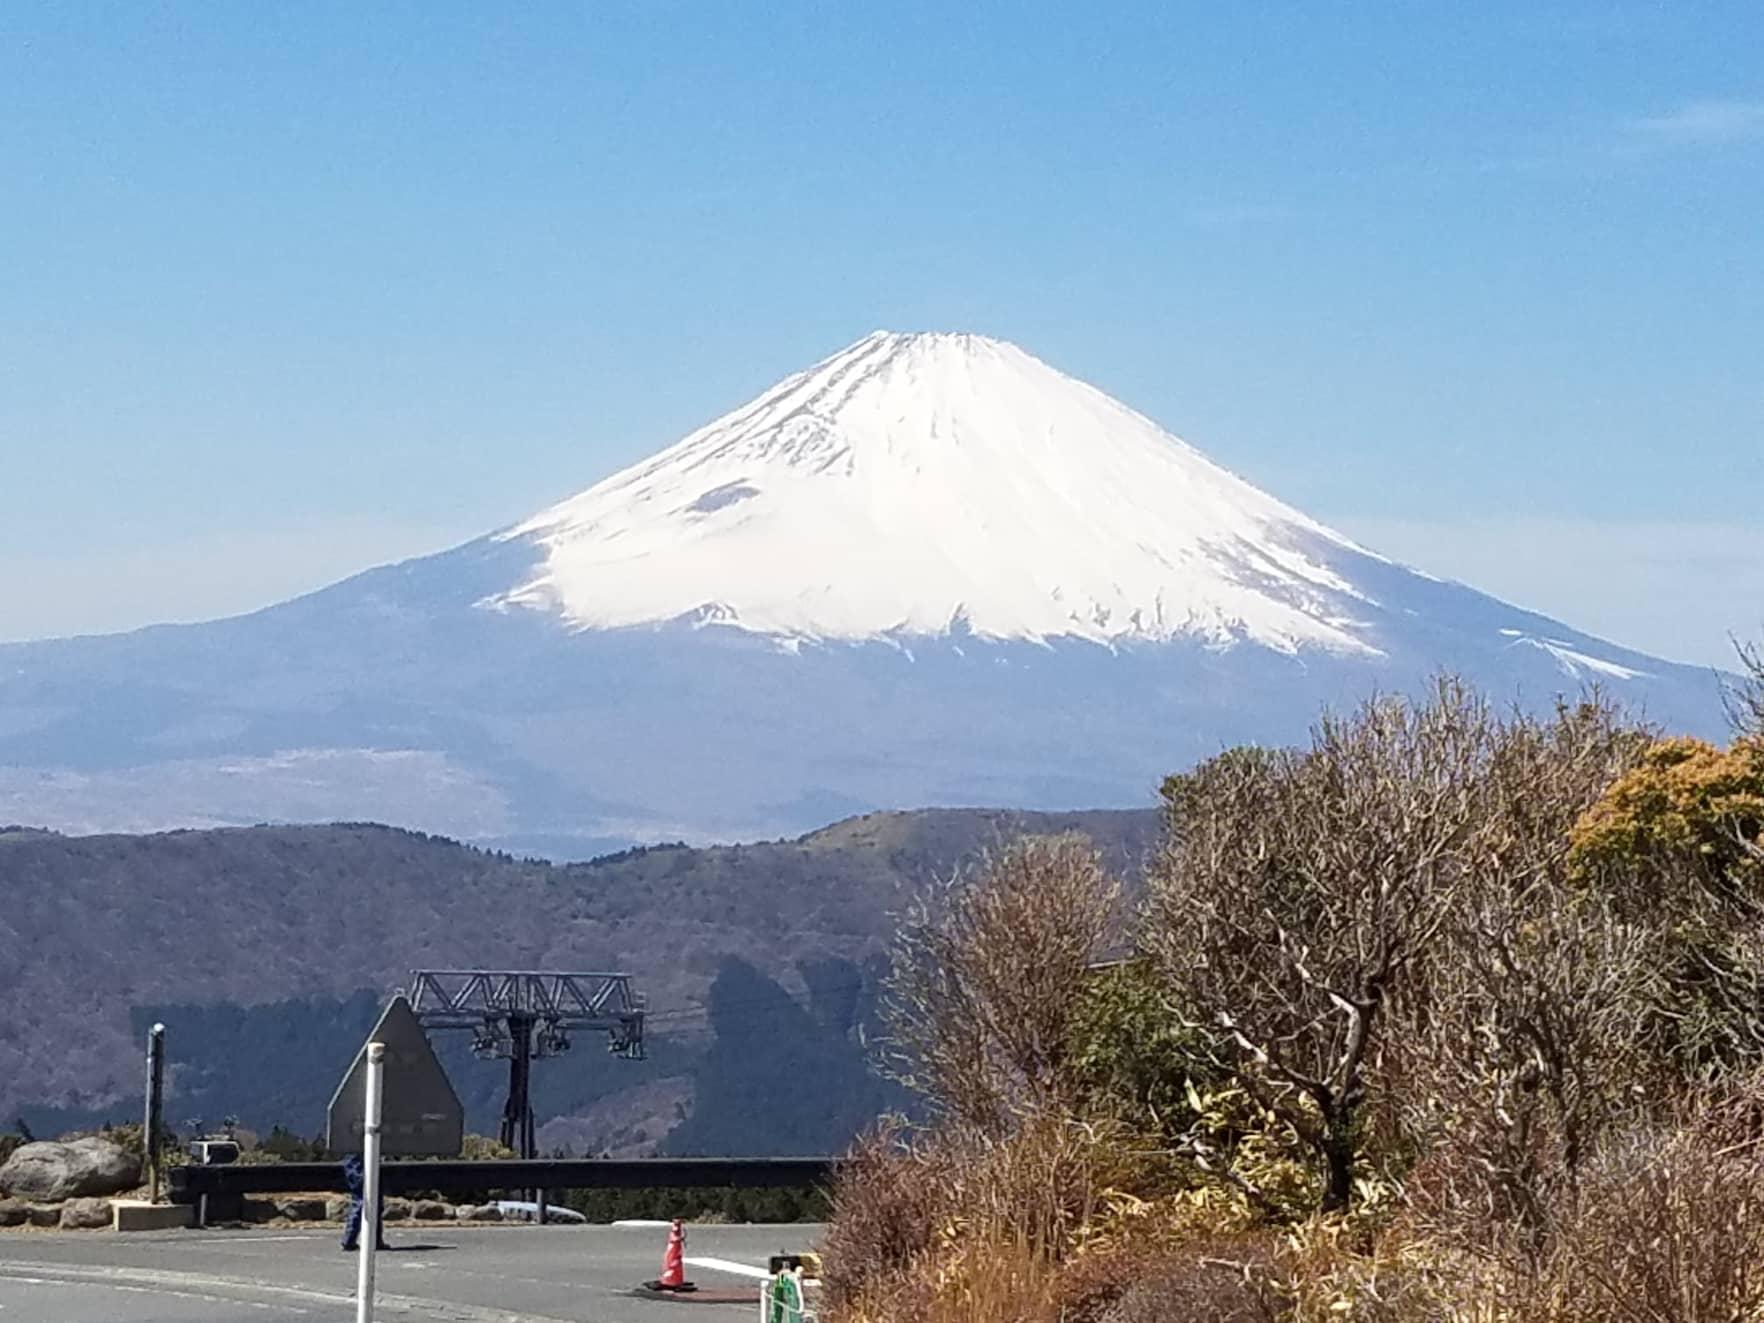 Fijisan, Owakudani, Hakone